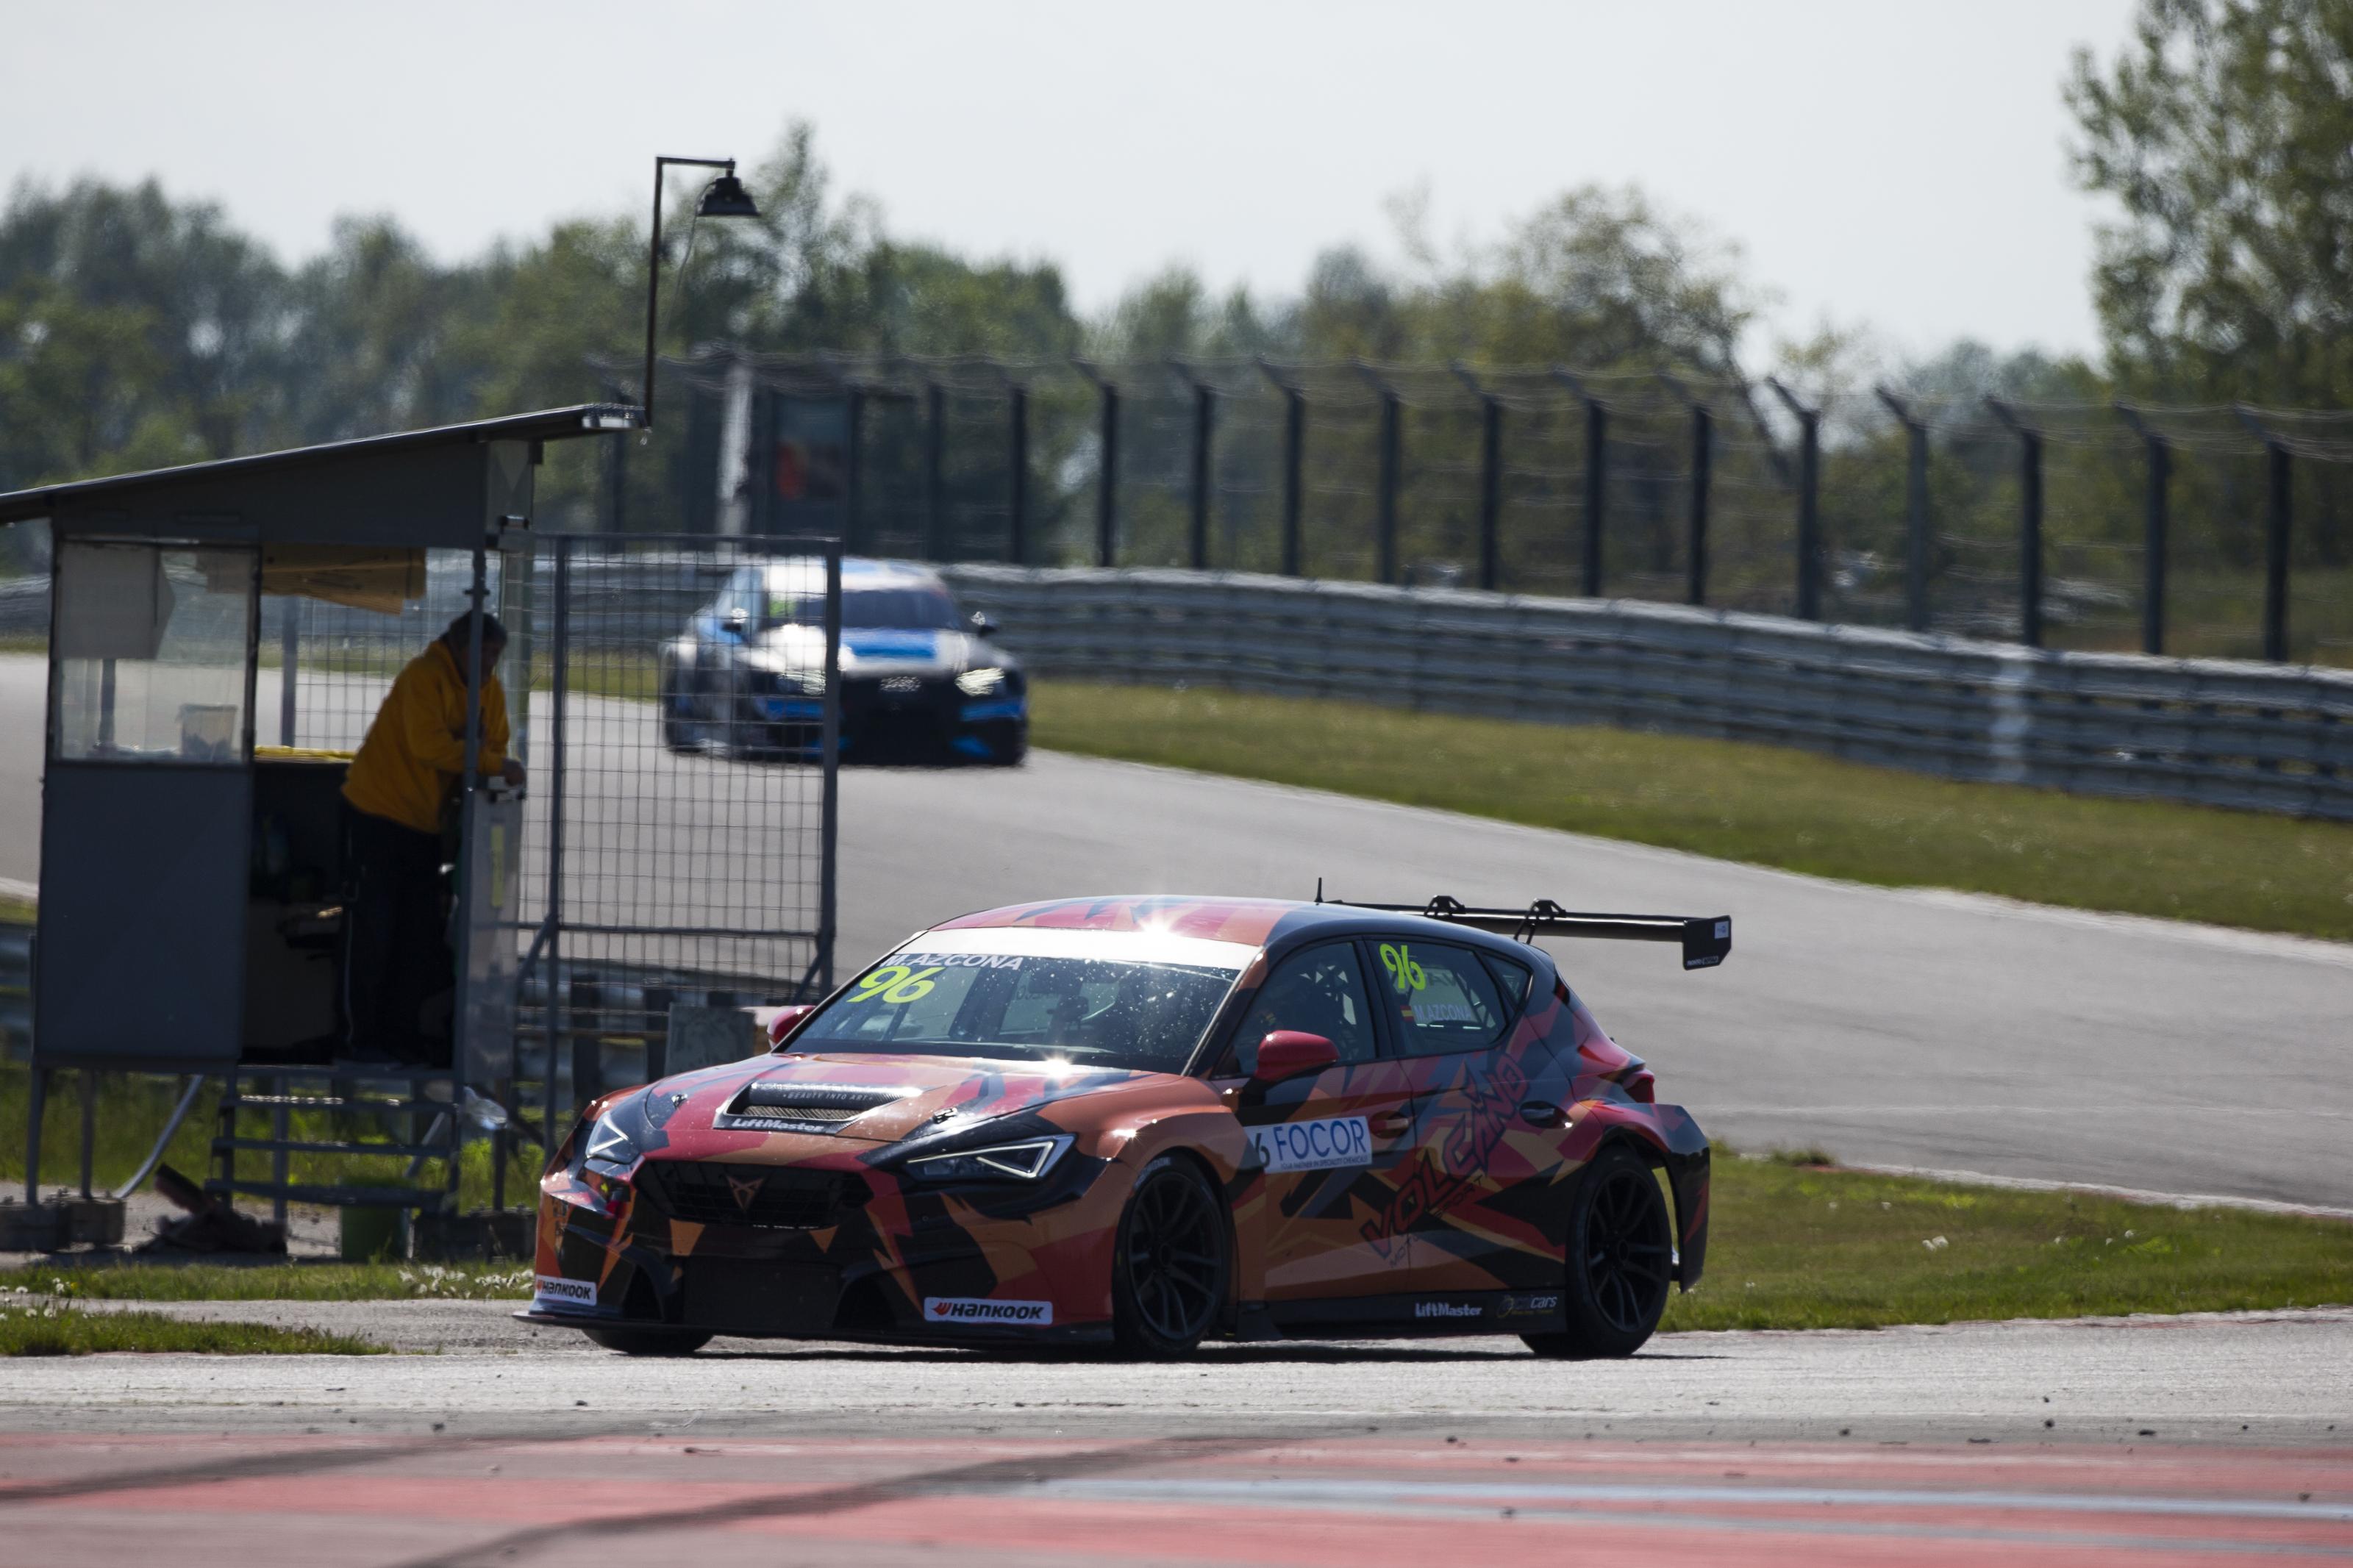 2021 Slovakiaring Race 1